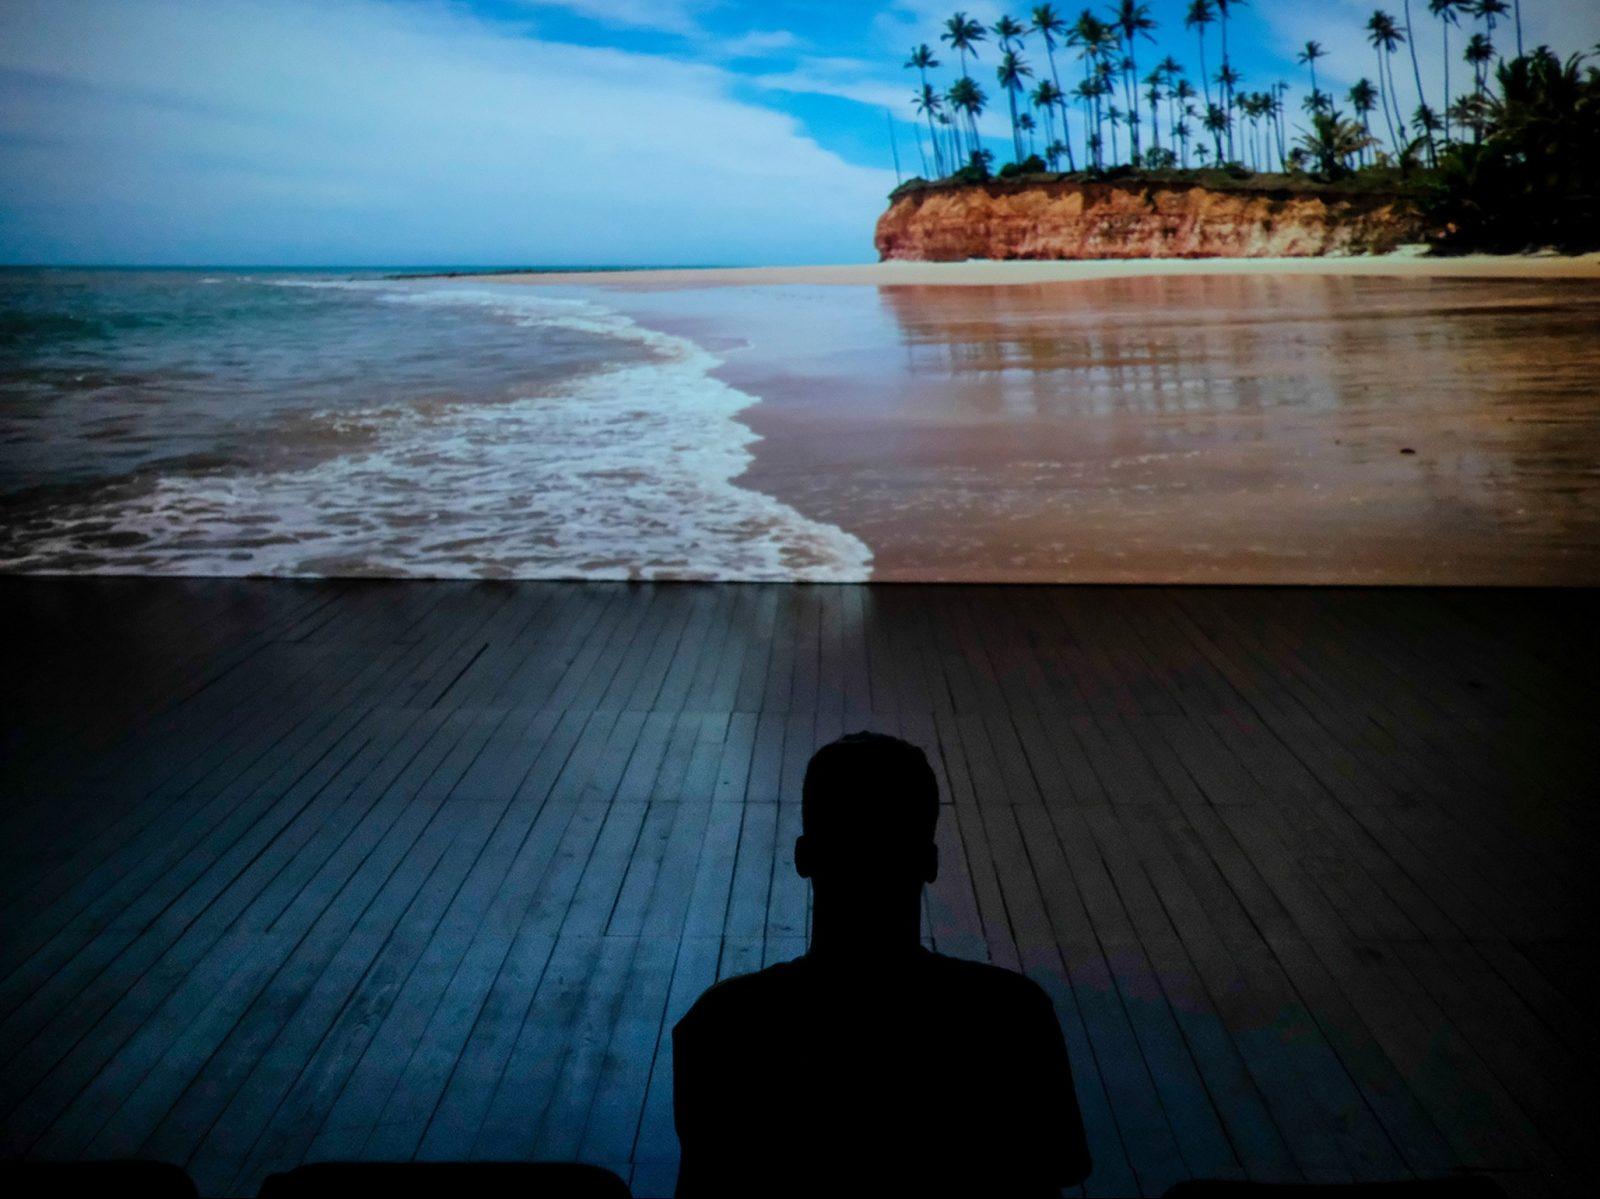 Atlântico, de Tiago Cadete, estreia no D. Maria II